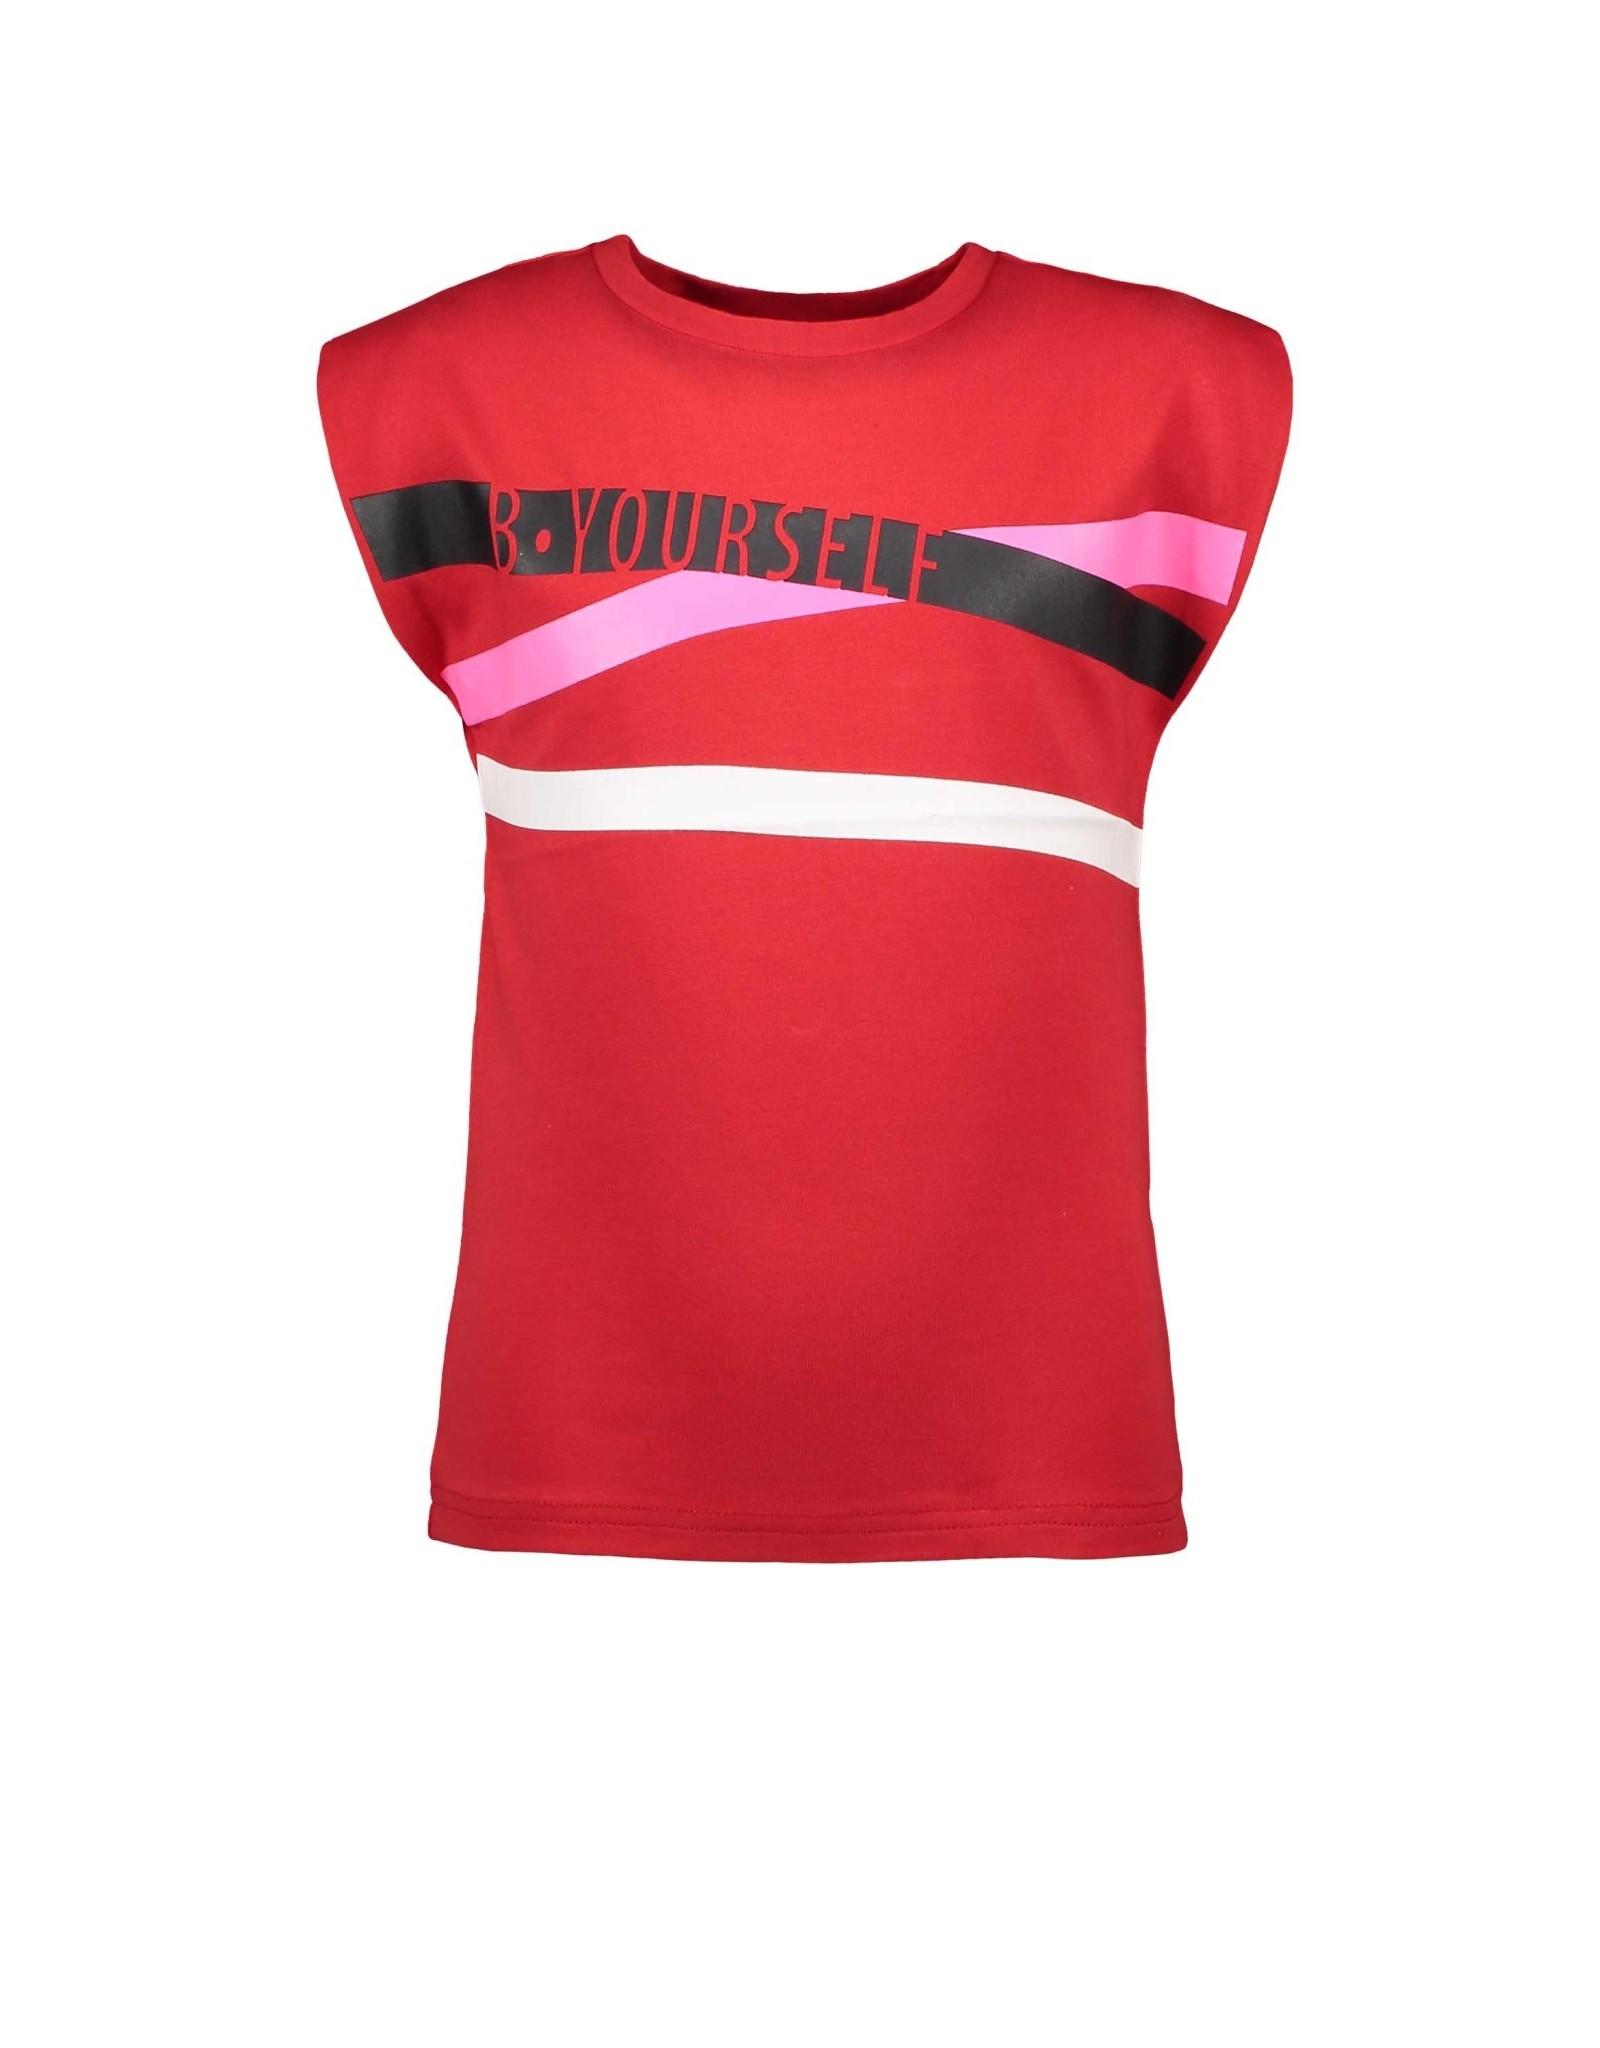 B.Nosy B.Nosy B.Yourself meisjes t-shirt rood met strepen